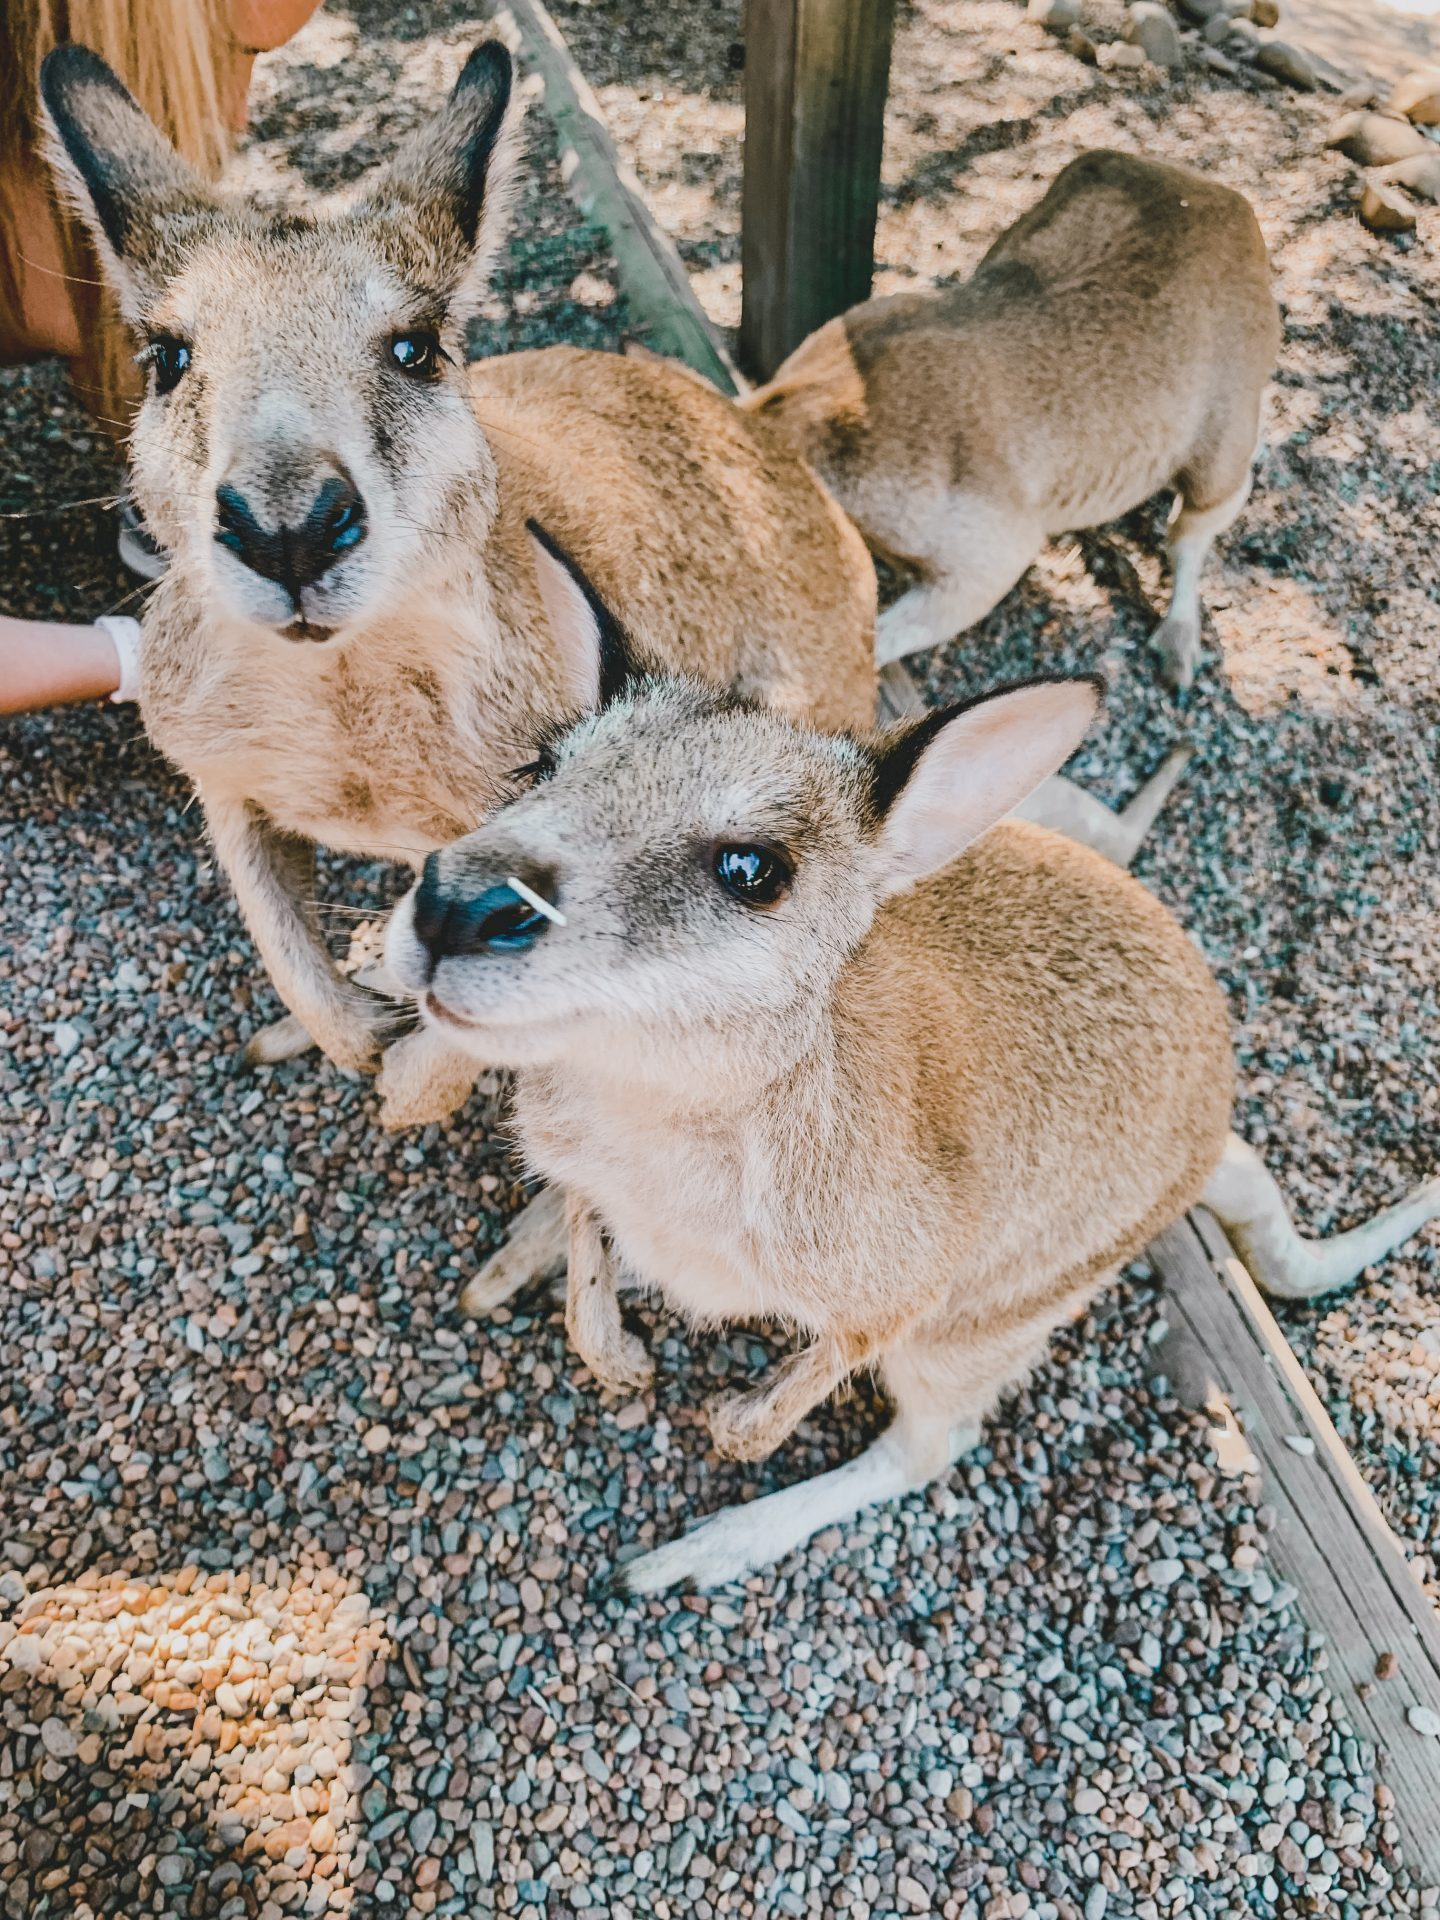 Feeding kangaroos at Featherdale Wildlife Sanctuary in Sydney, Australia!